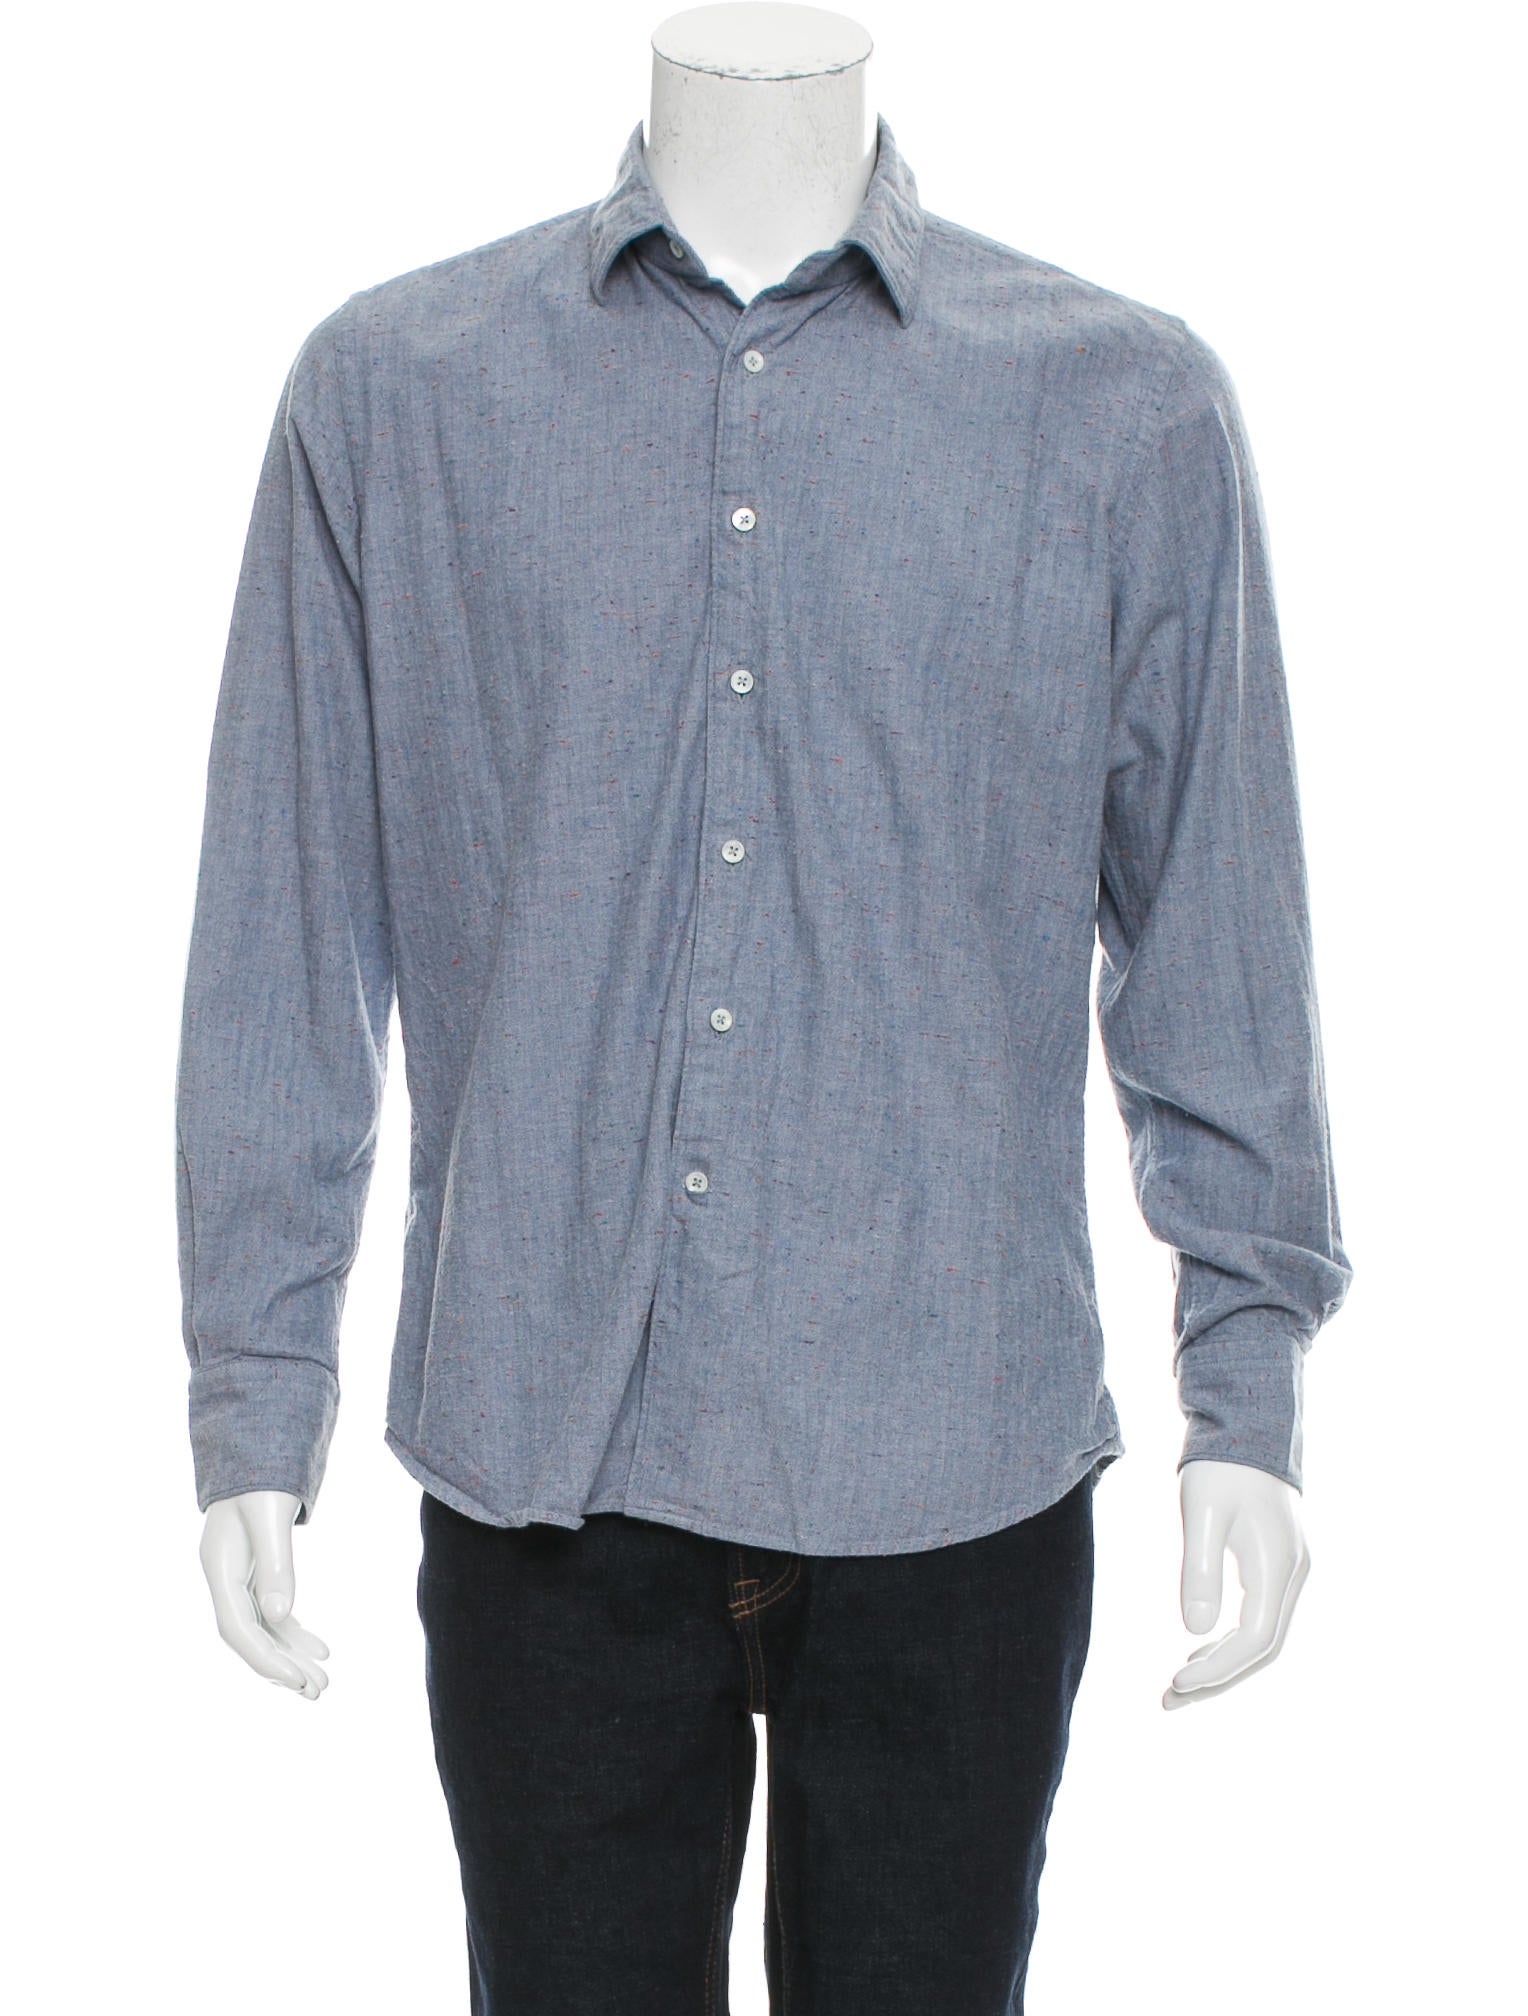 Glanshirt Long Sleeve Button Up Shirt Clothing